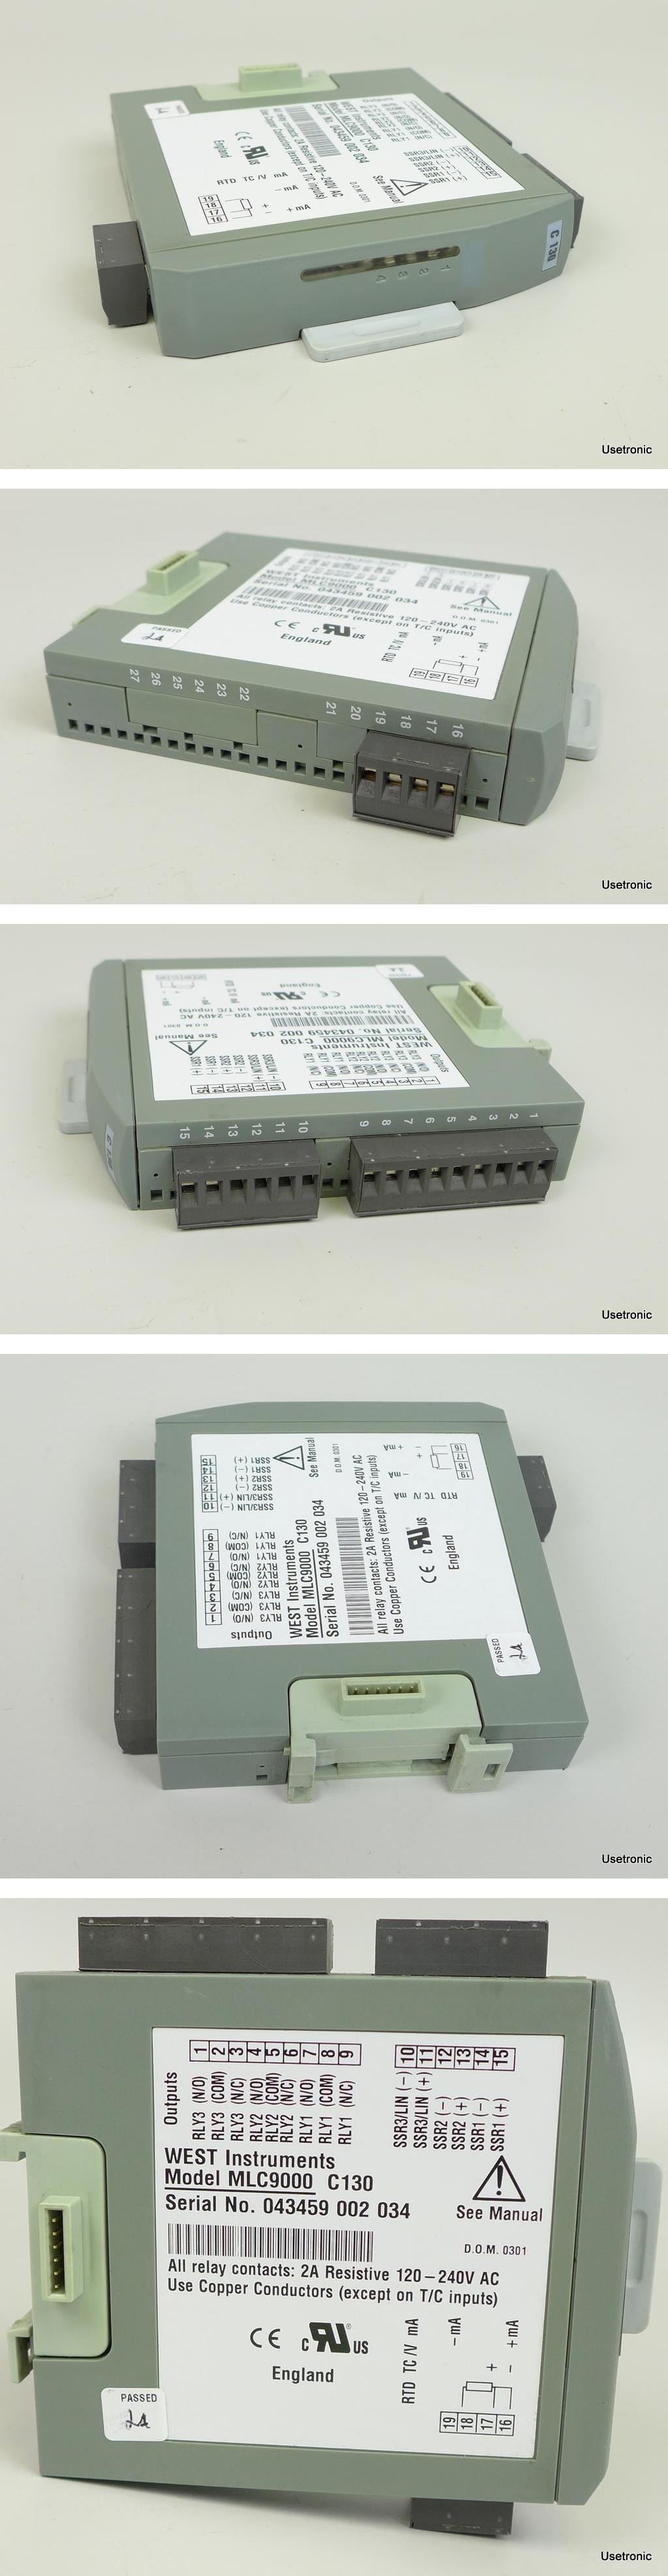 West Instruments MLC9000 C130